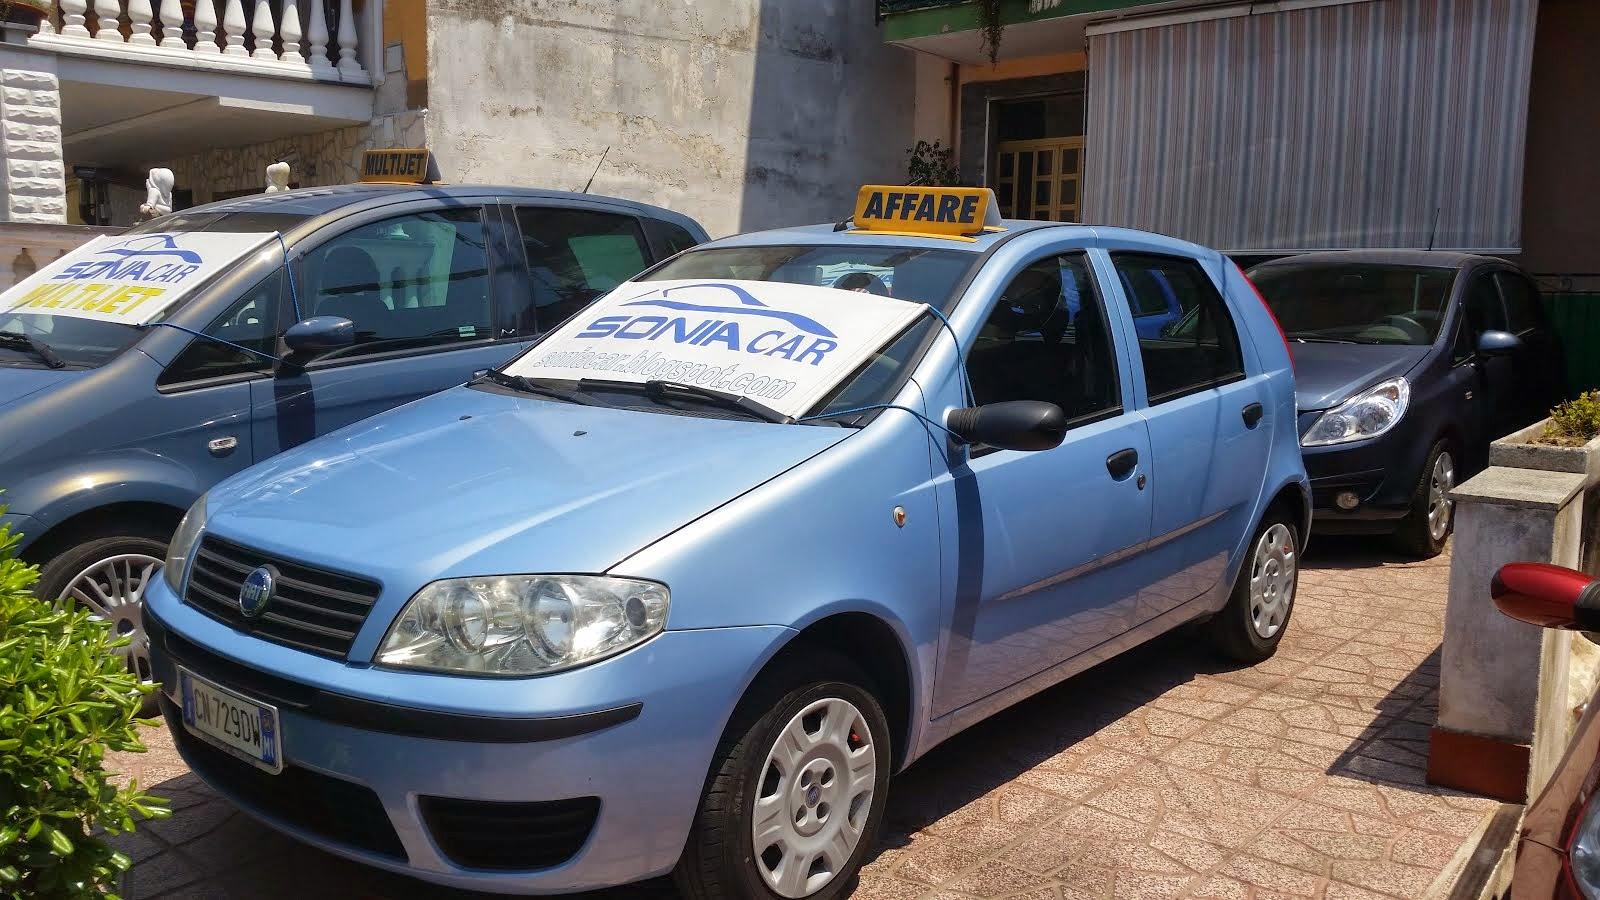 Fiat Punto 1.2 dinamyc anno 2004 80.000km 3.000,00 euro